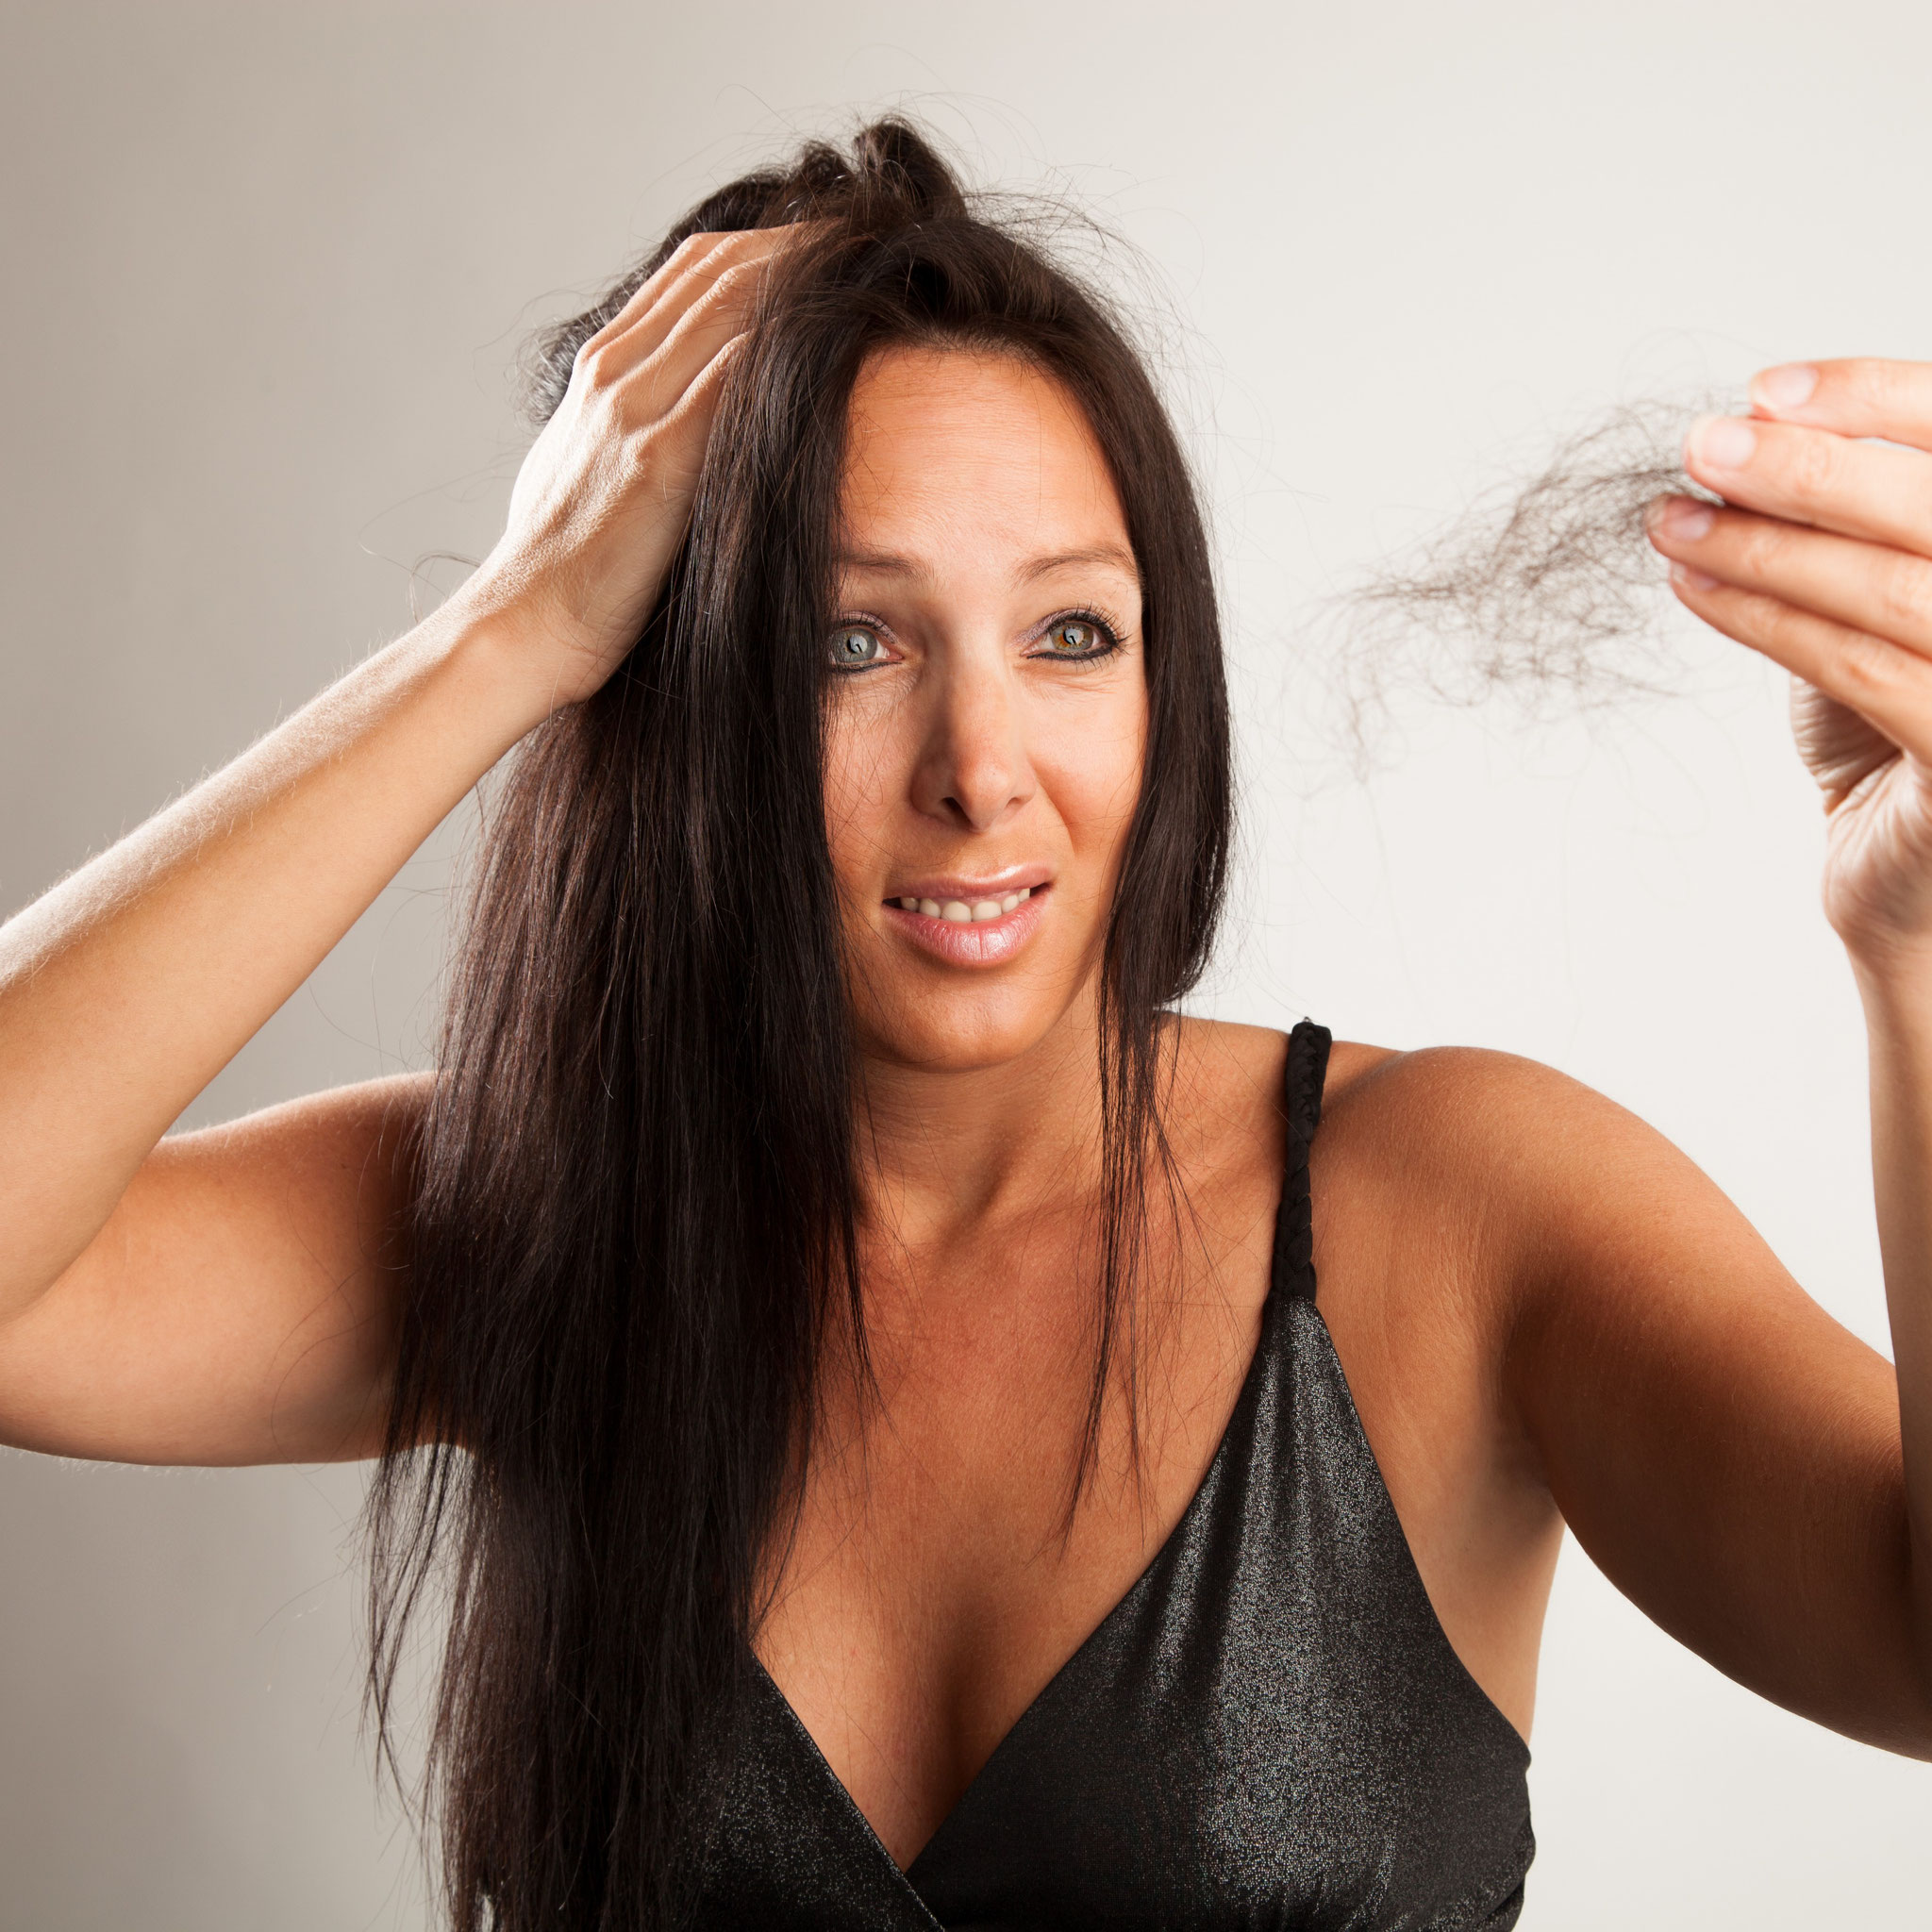 Haarausfall muß nicht sein